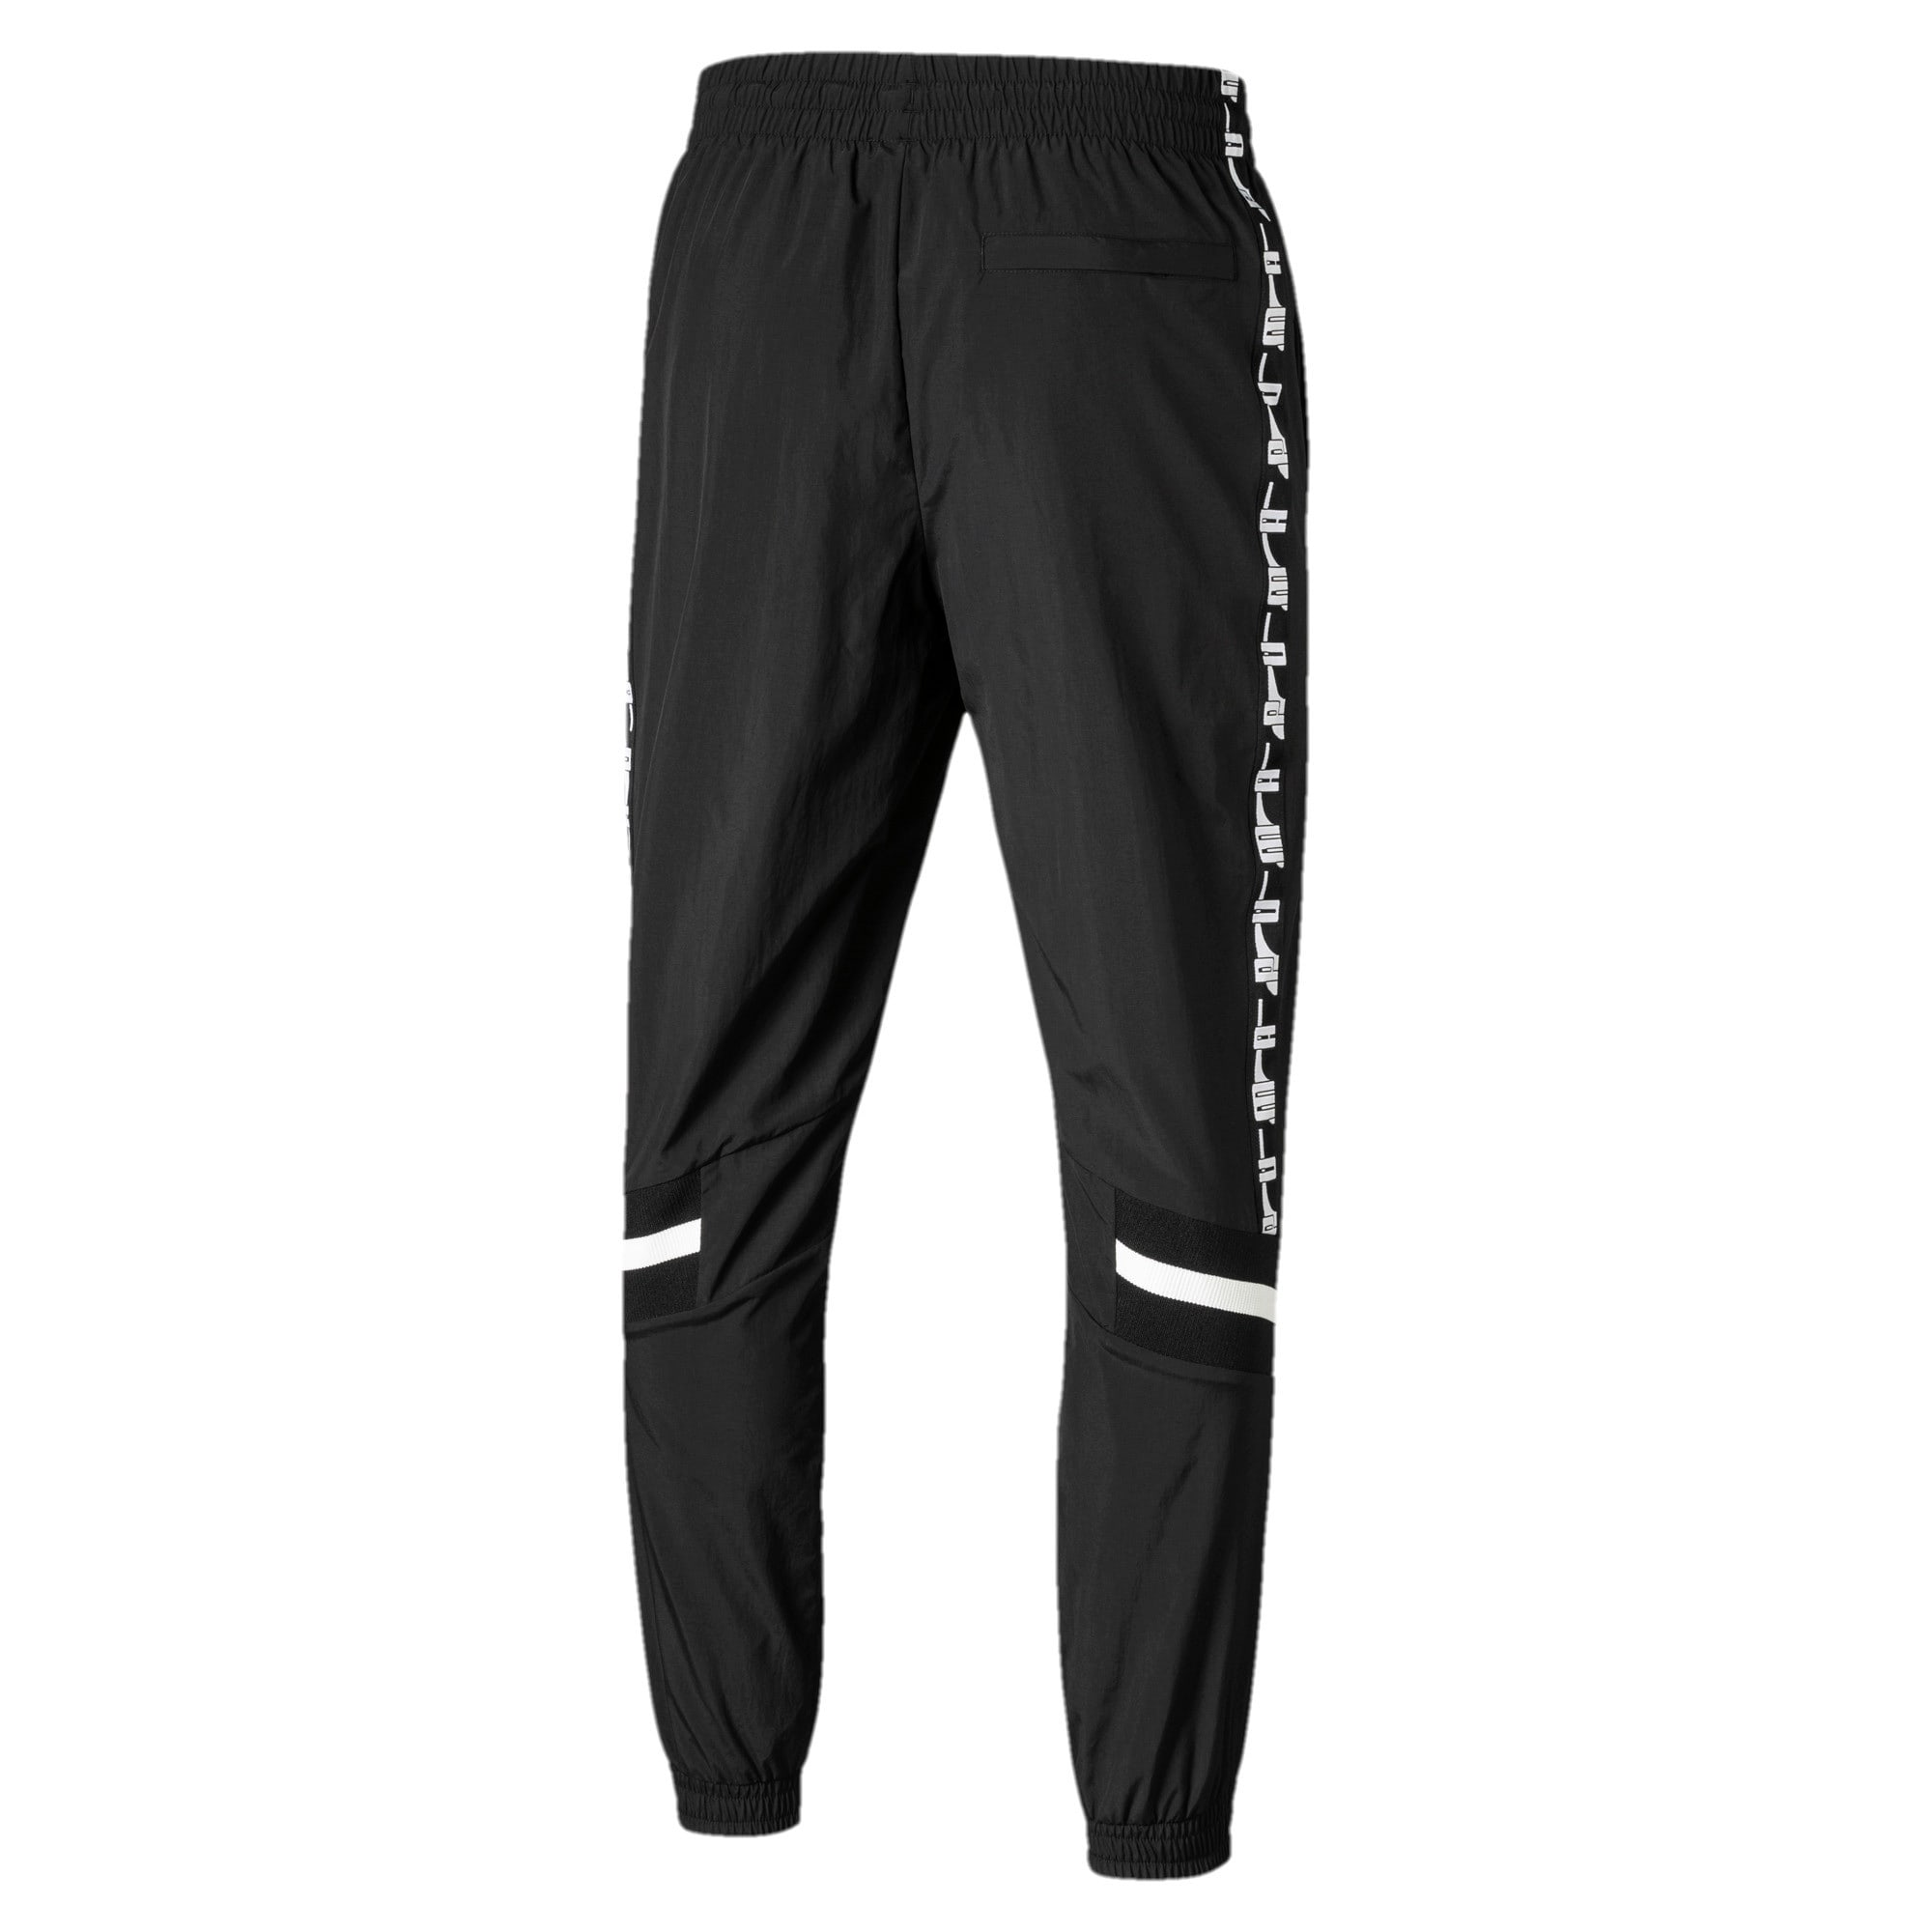 Thumbnail 5 of PUMA XTG Men's Woven Pants, Puma Black, medium